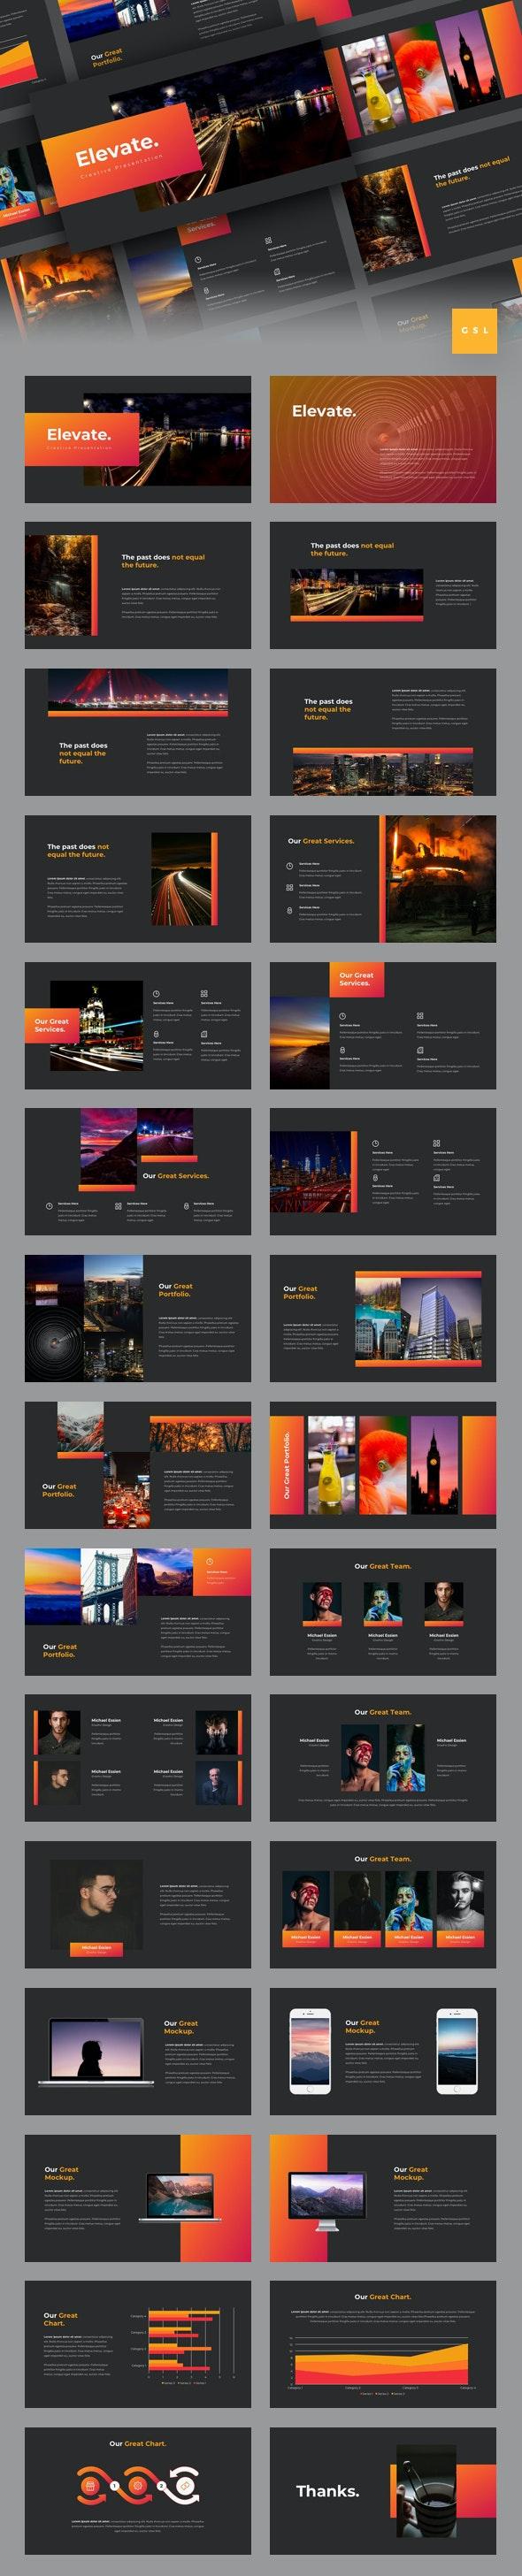 Elevate - Creative Google Slides Template - Google Slides Presentation Templates